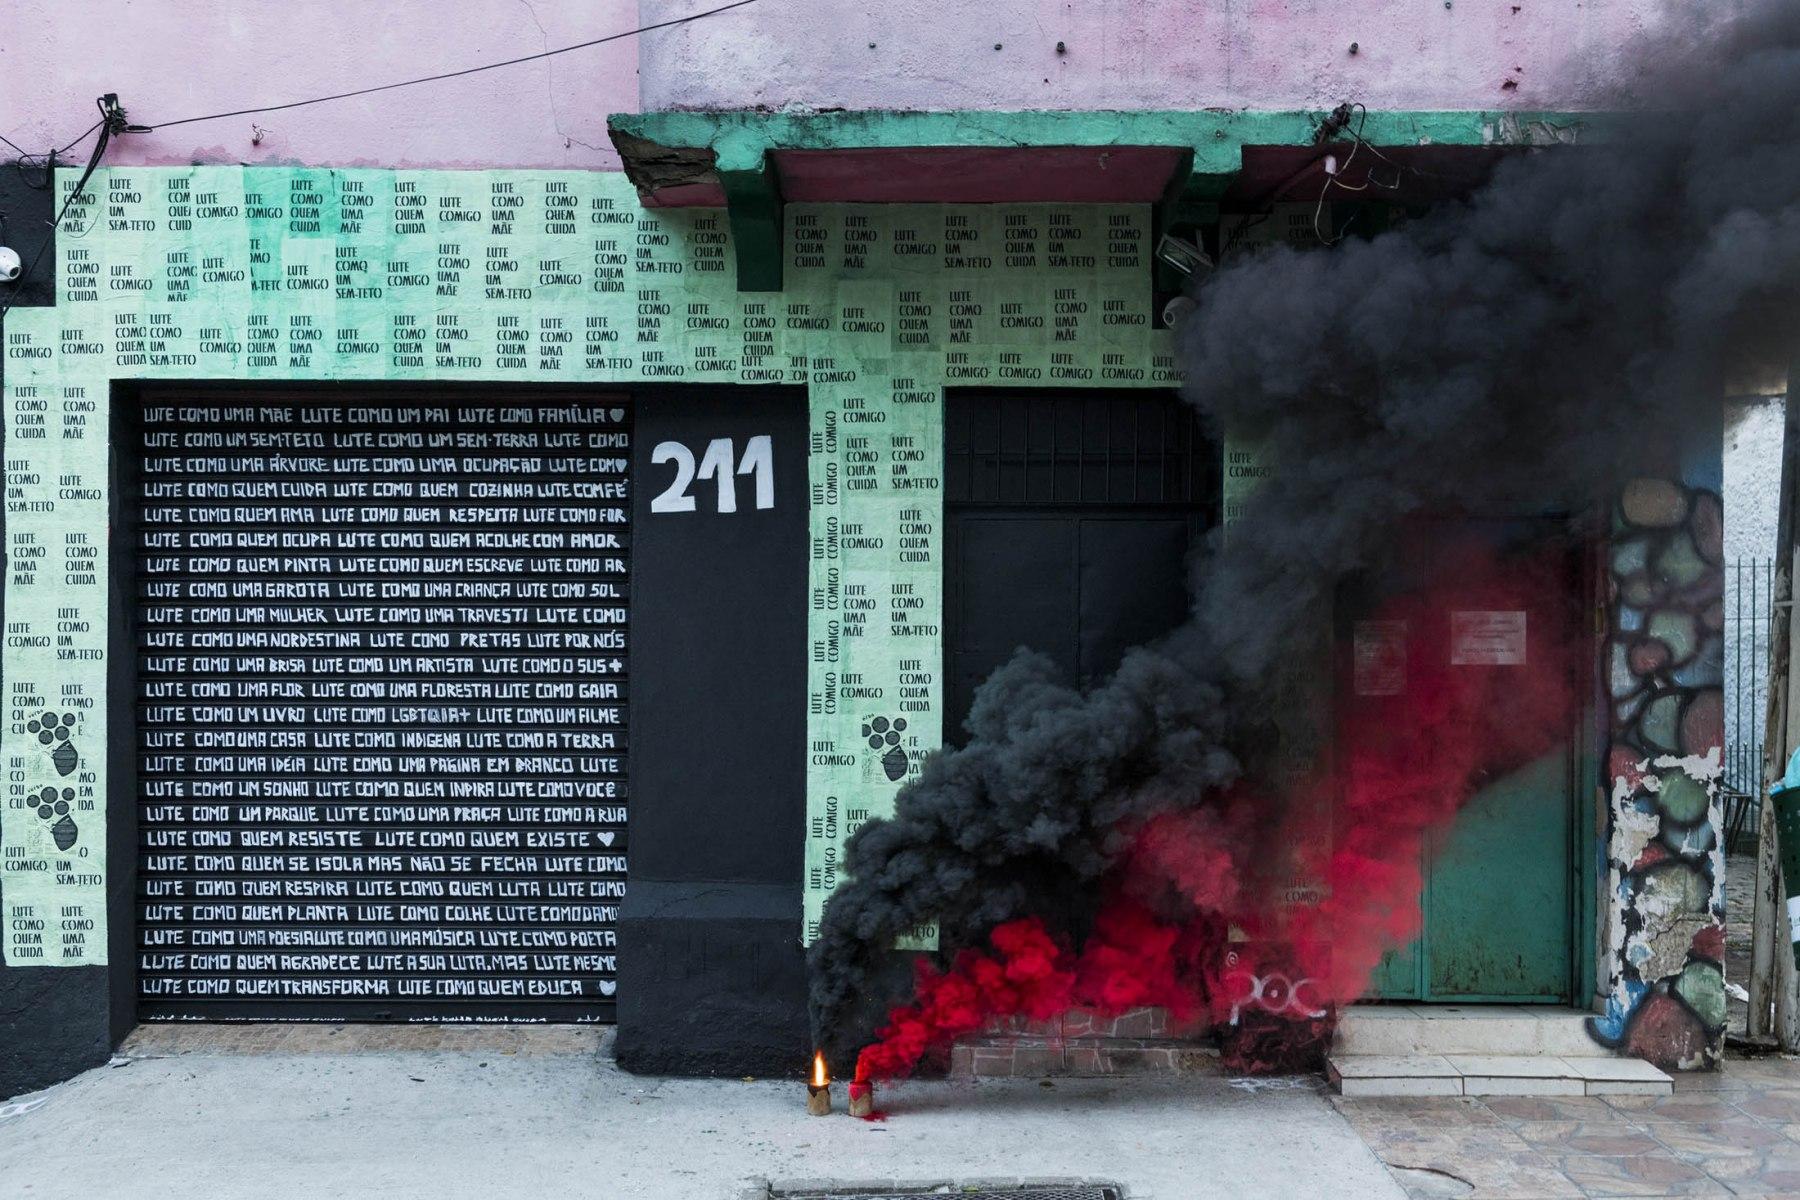 Casa-Verbo-no-bairro-do-Bixiga.-Foto_-Fumaca-Antifascista_divulgacao